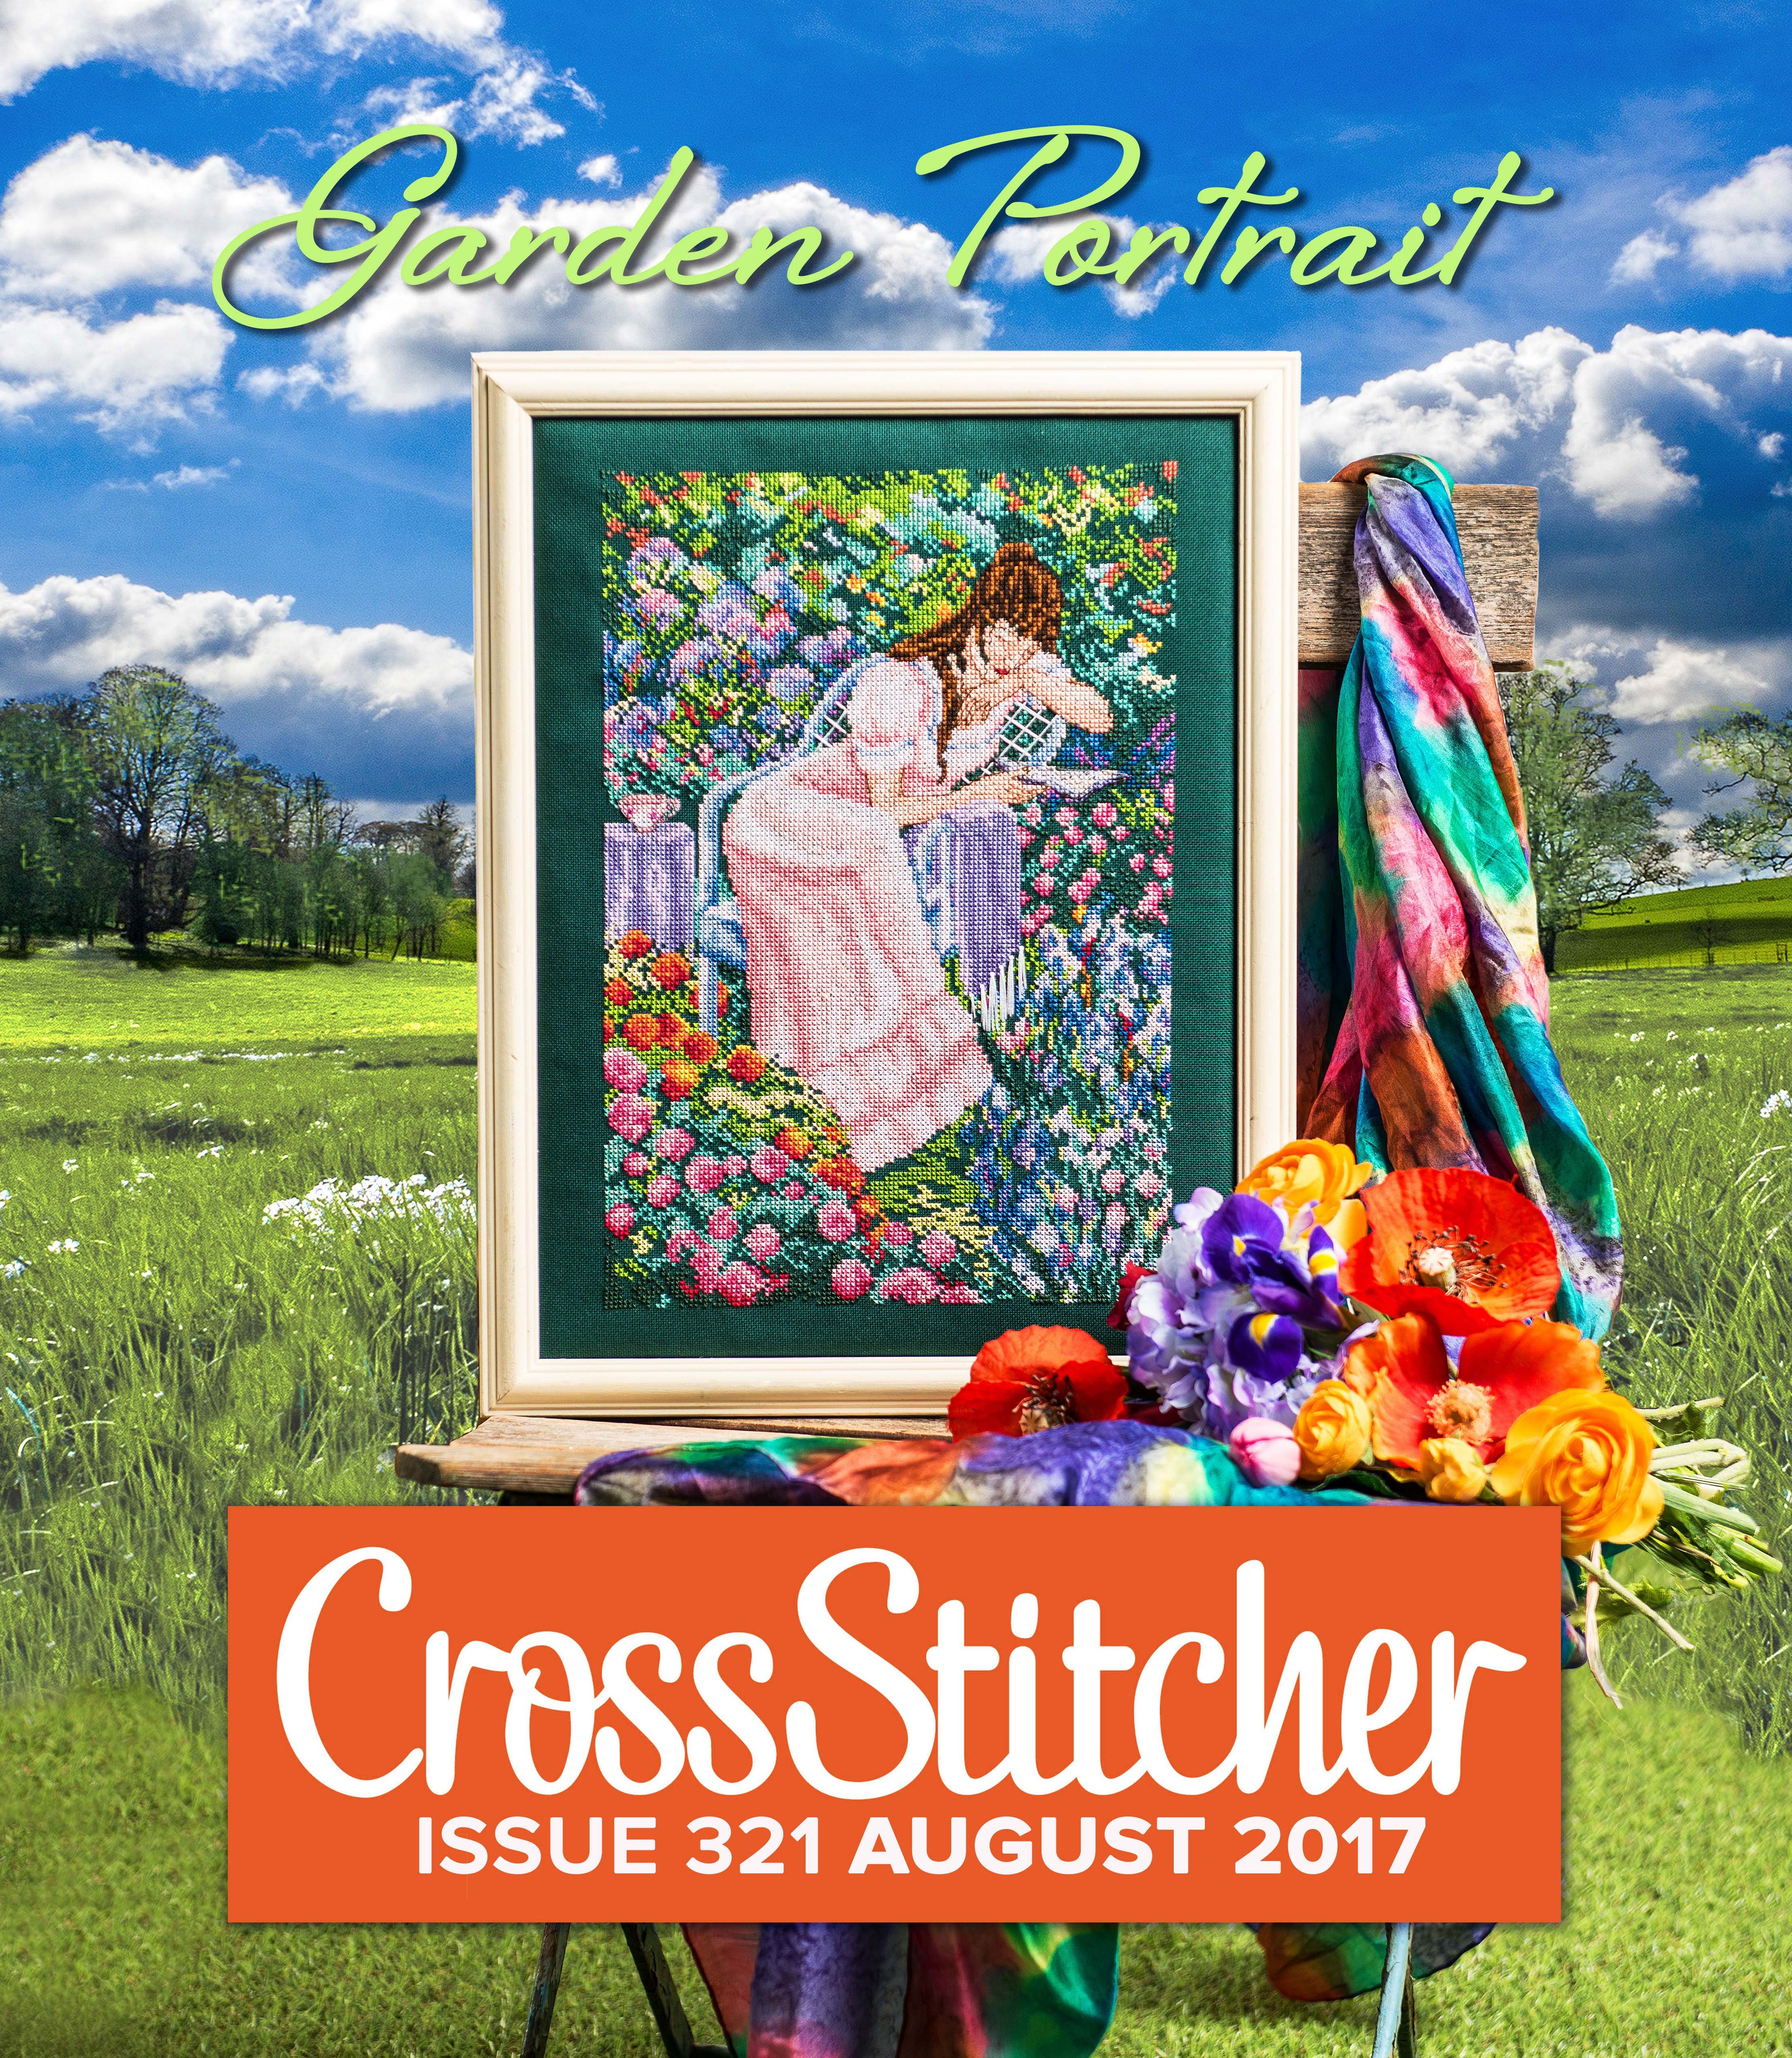 Cross Stitcher Project Pack - Garden Portrait Issue 321